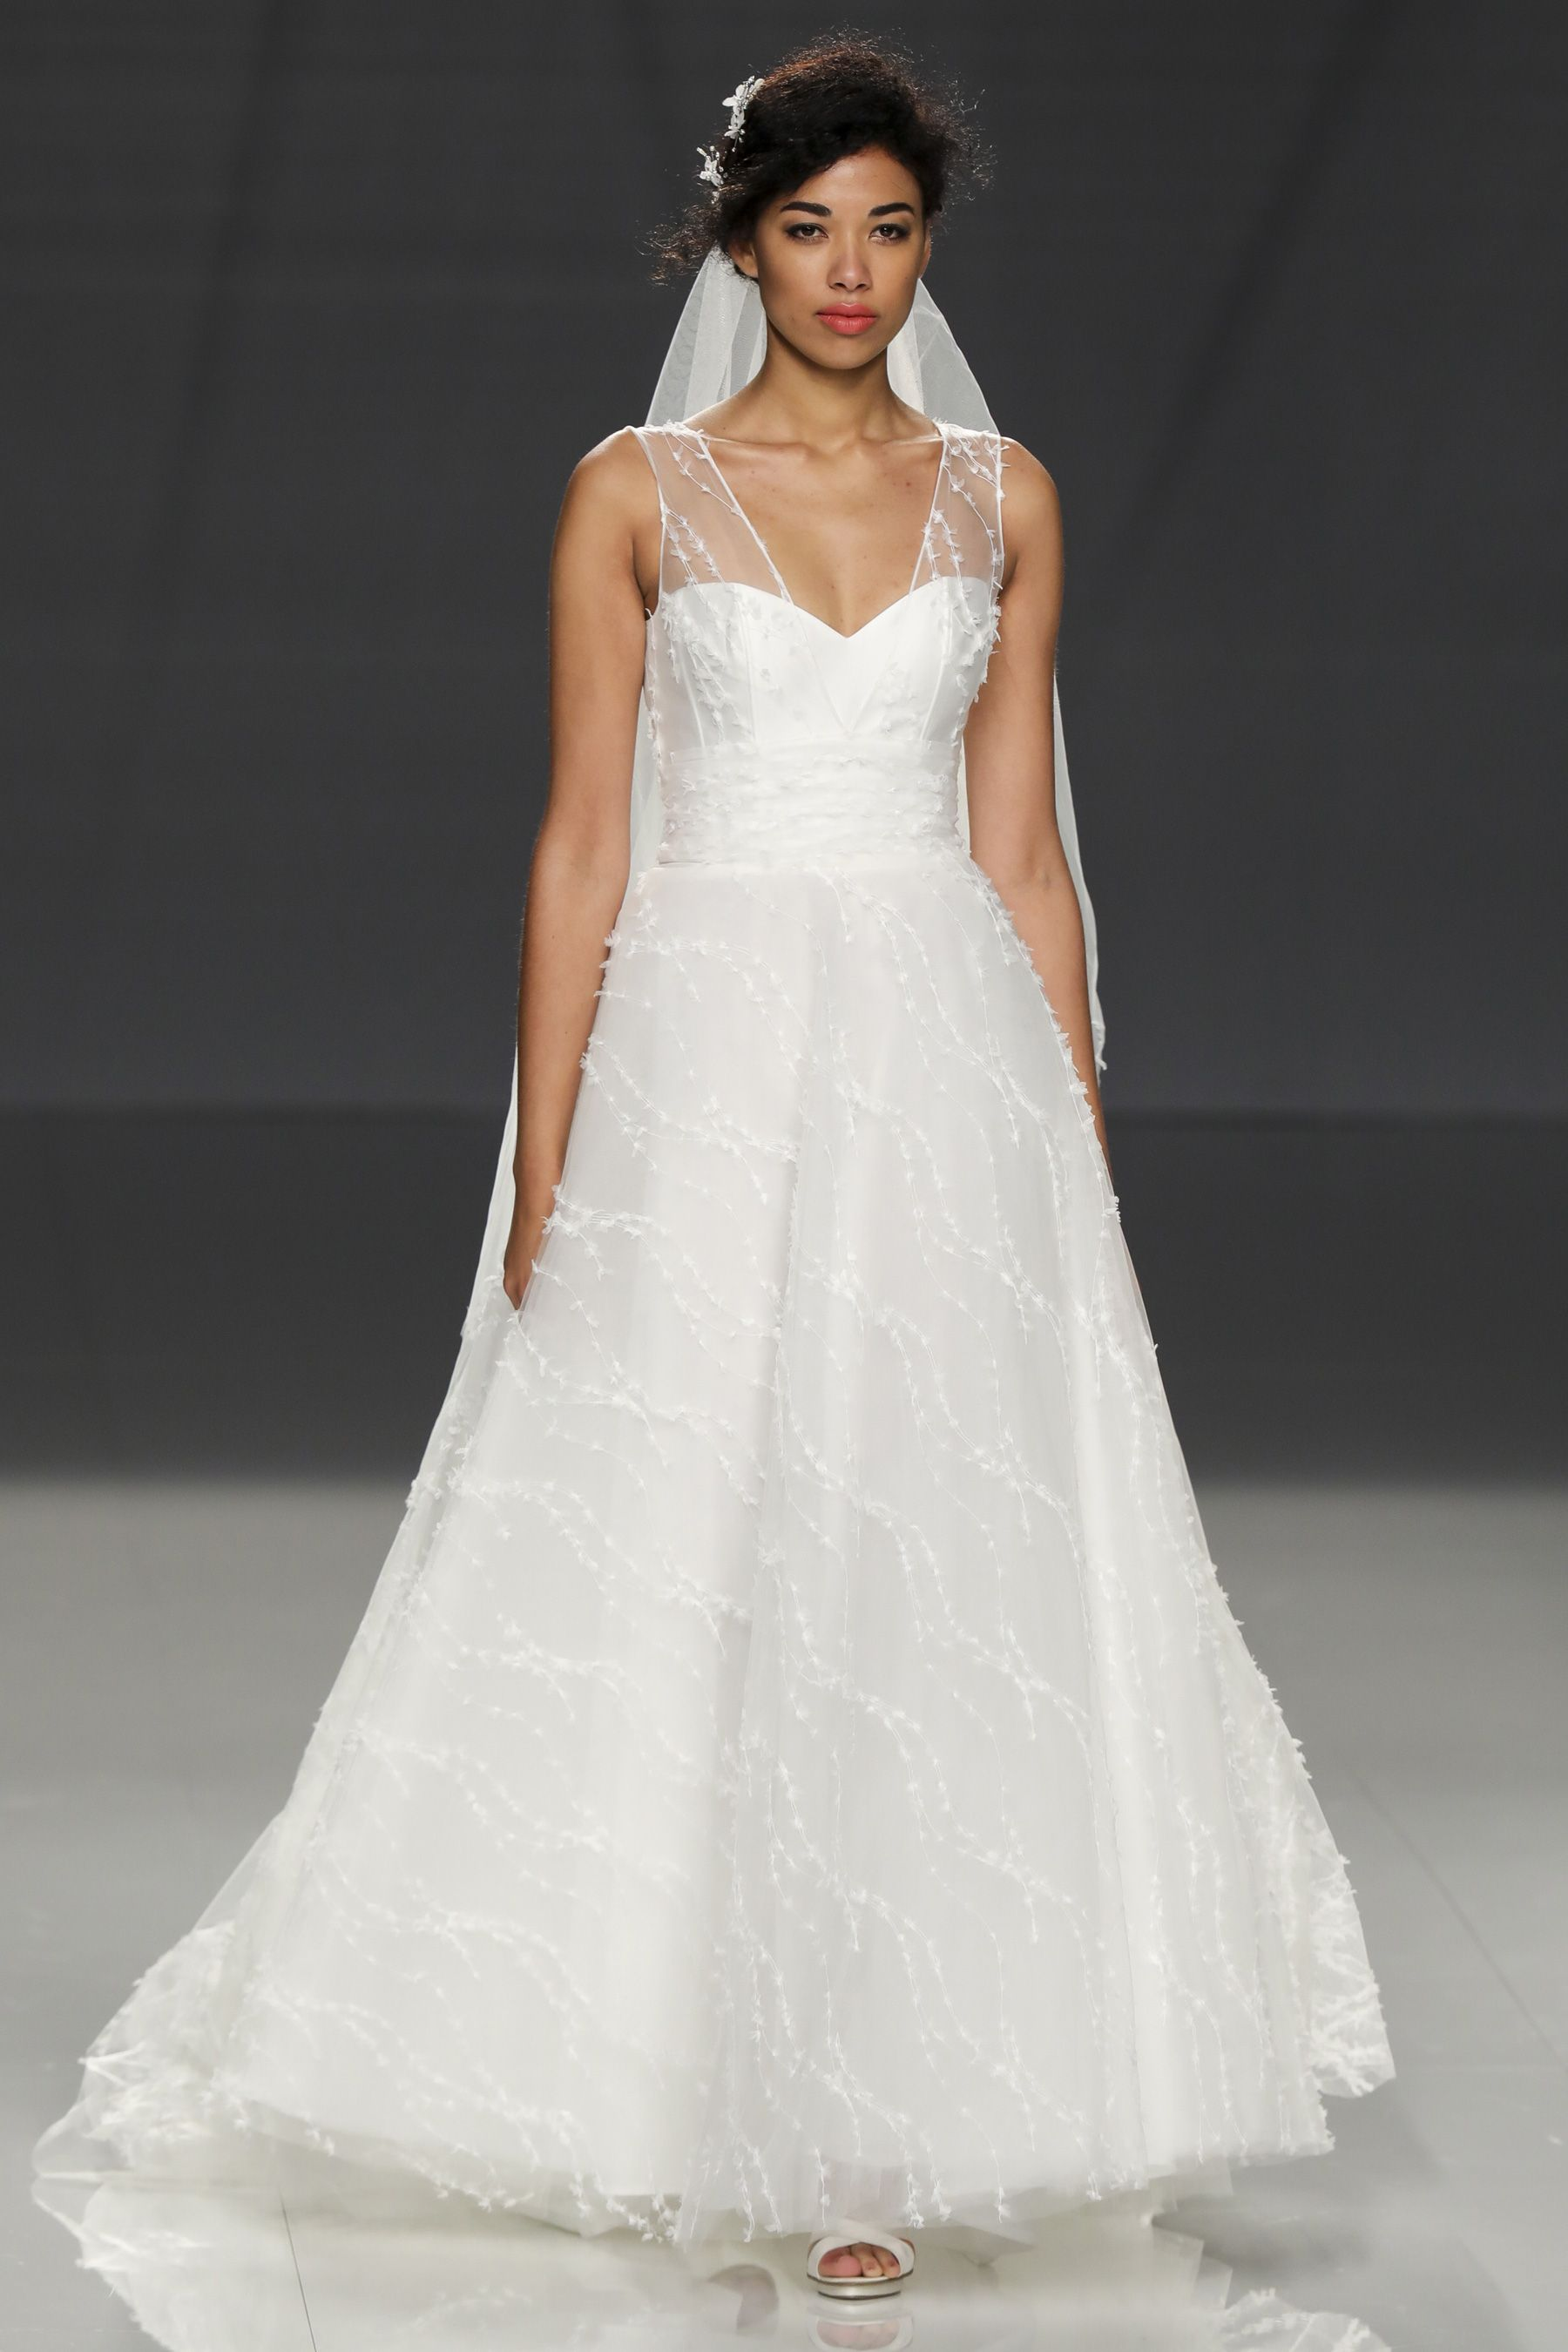 Cymbeline Wedding Dresses Dresses Bridal [ 2700 x 1800 Pixel ]